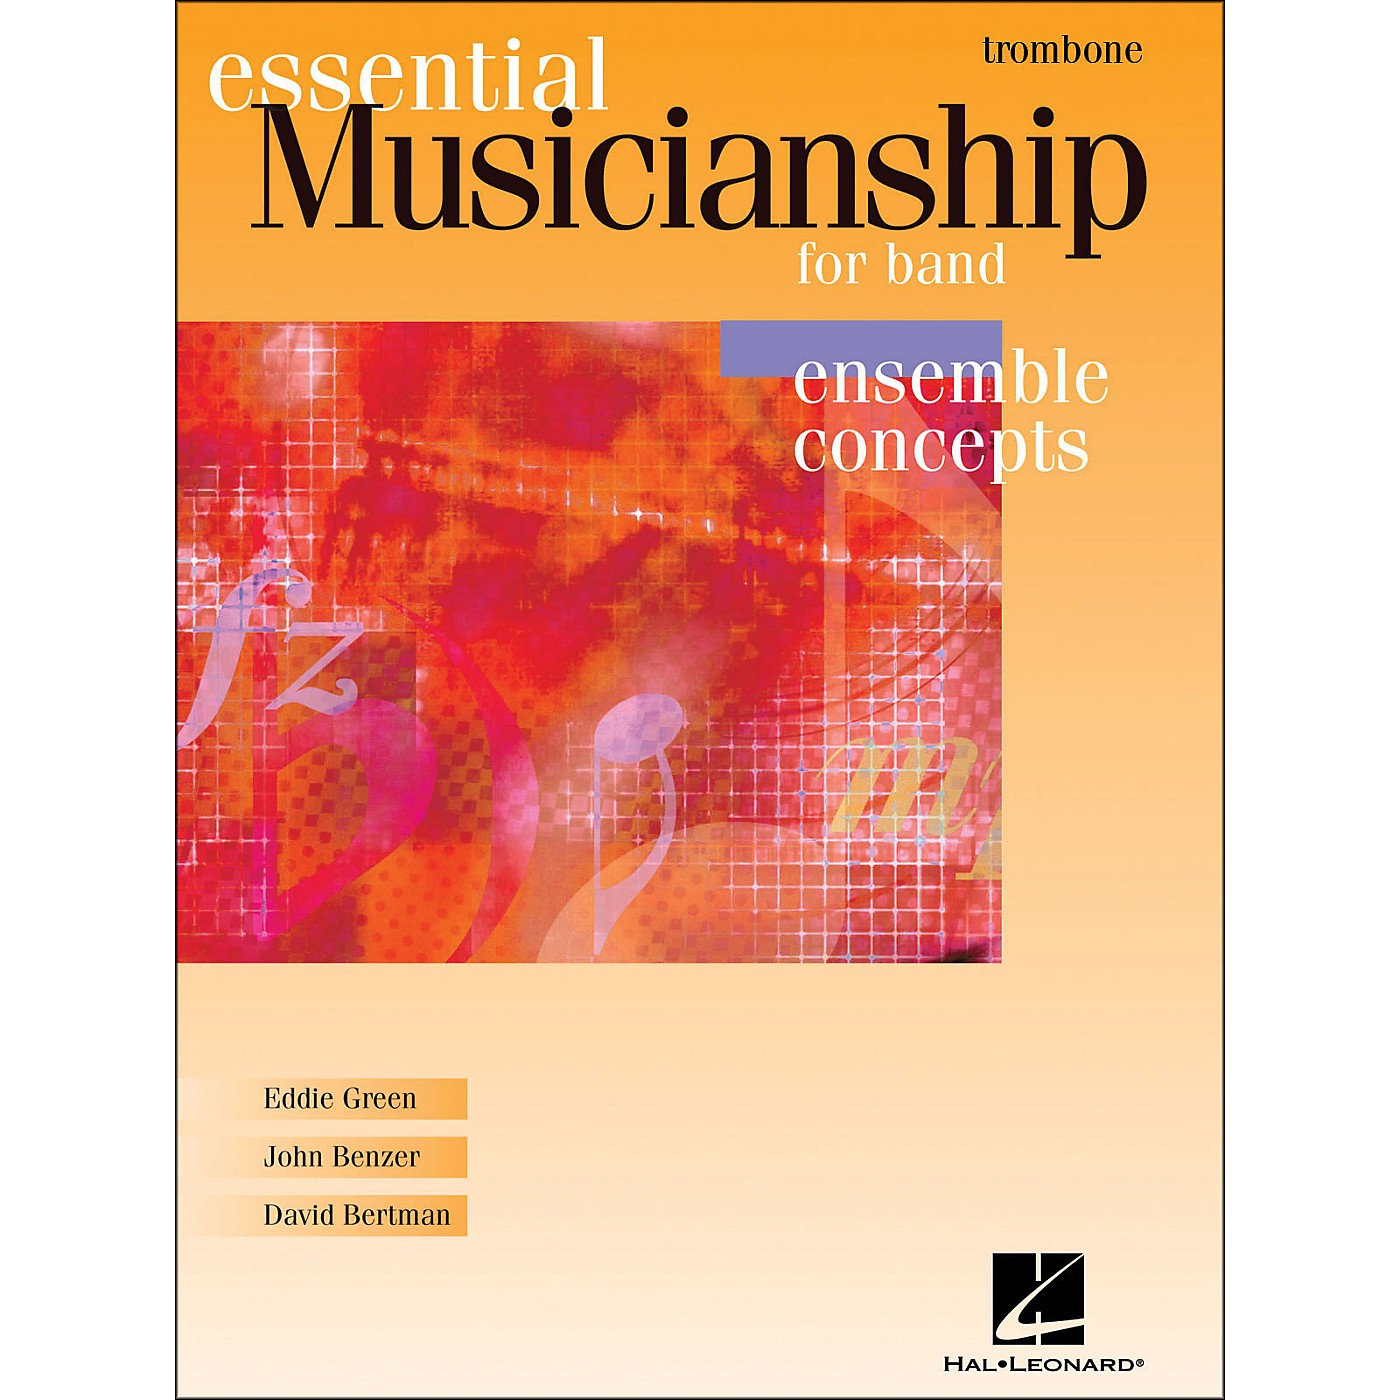 Hal Leonard Essential Musicianship for Band - Ensemble Concepts Trombone thumbnail